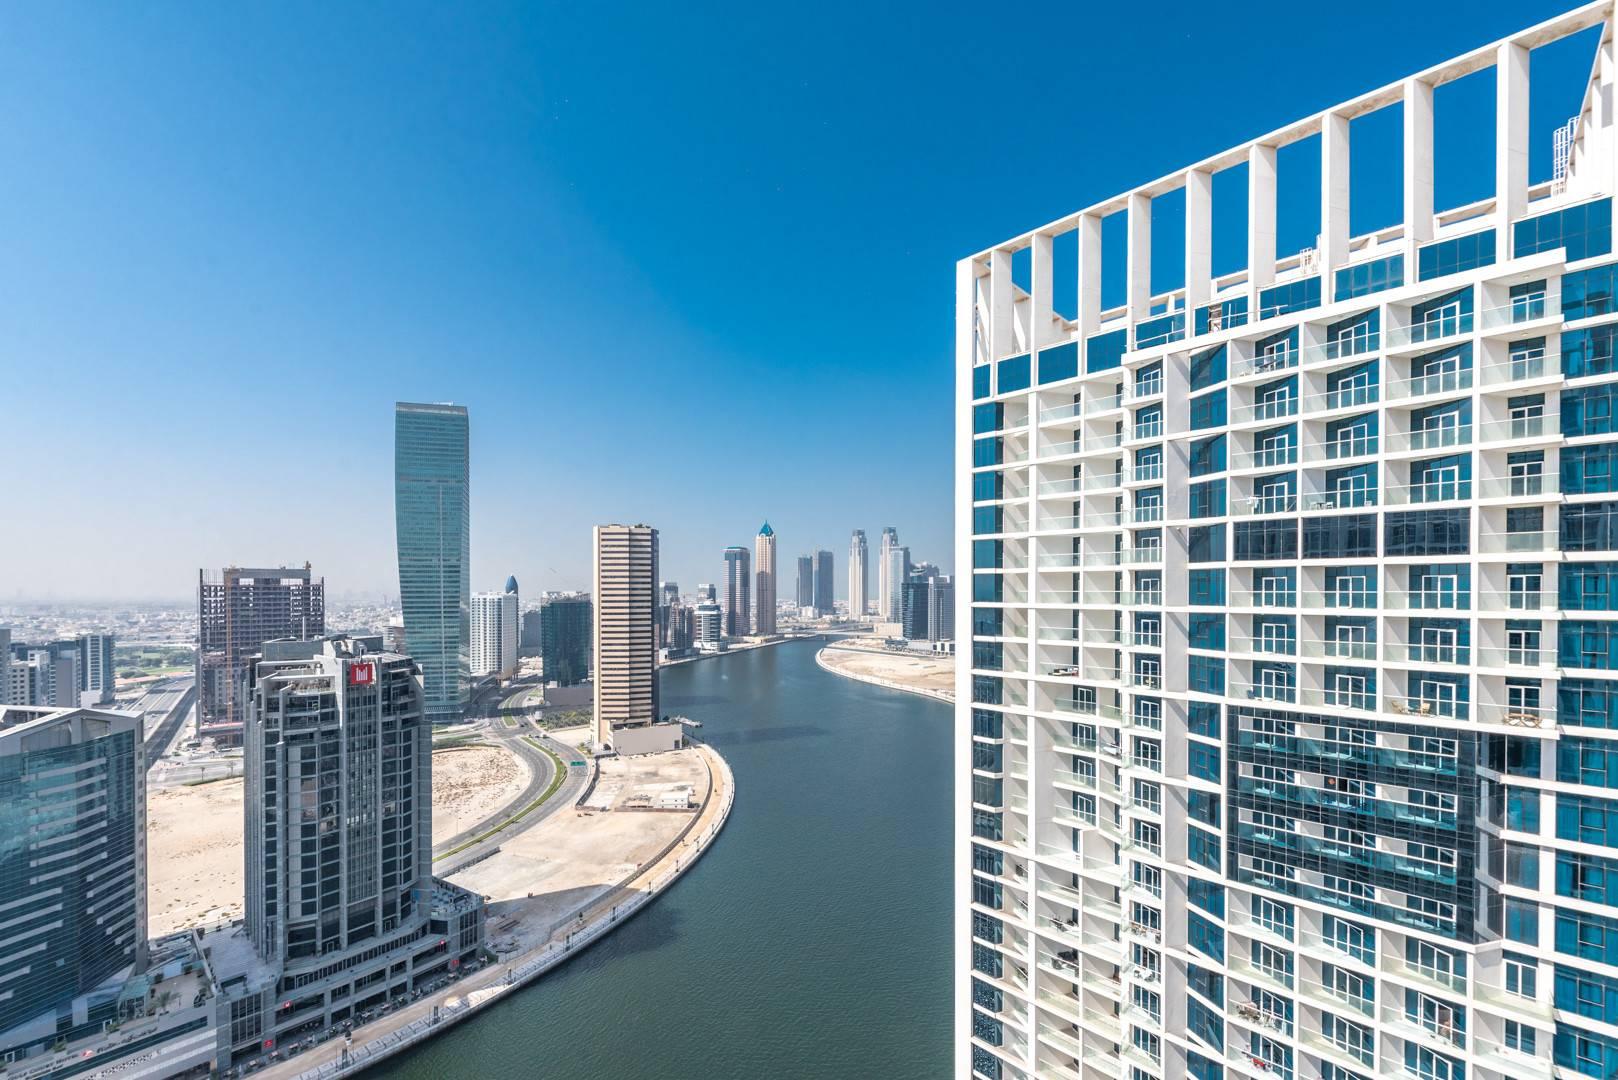 Апартаменты, sale в DAMAC Maison Prive Дубай, ОАЭ